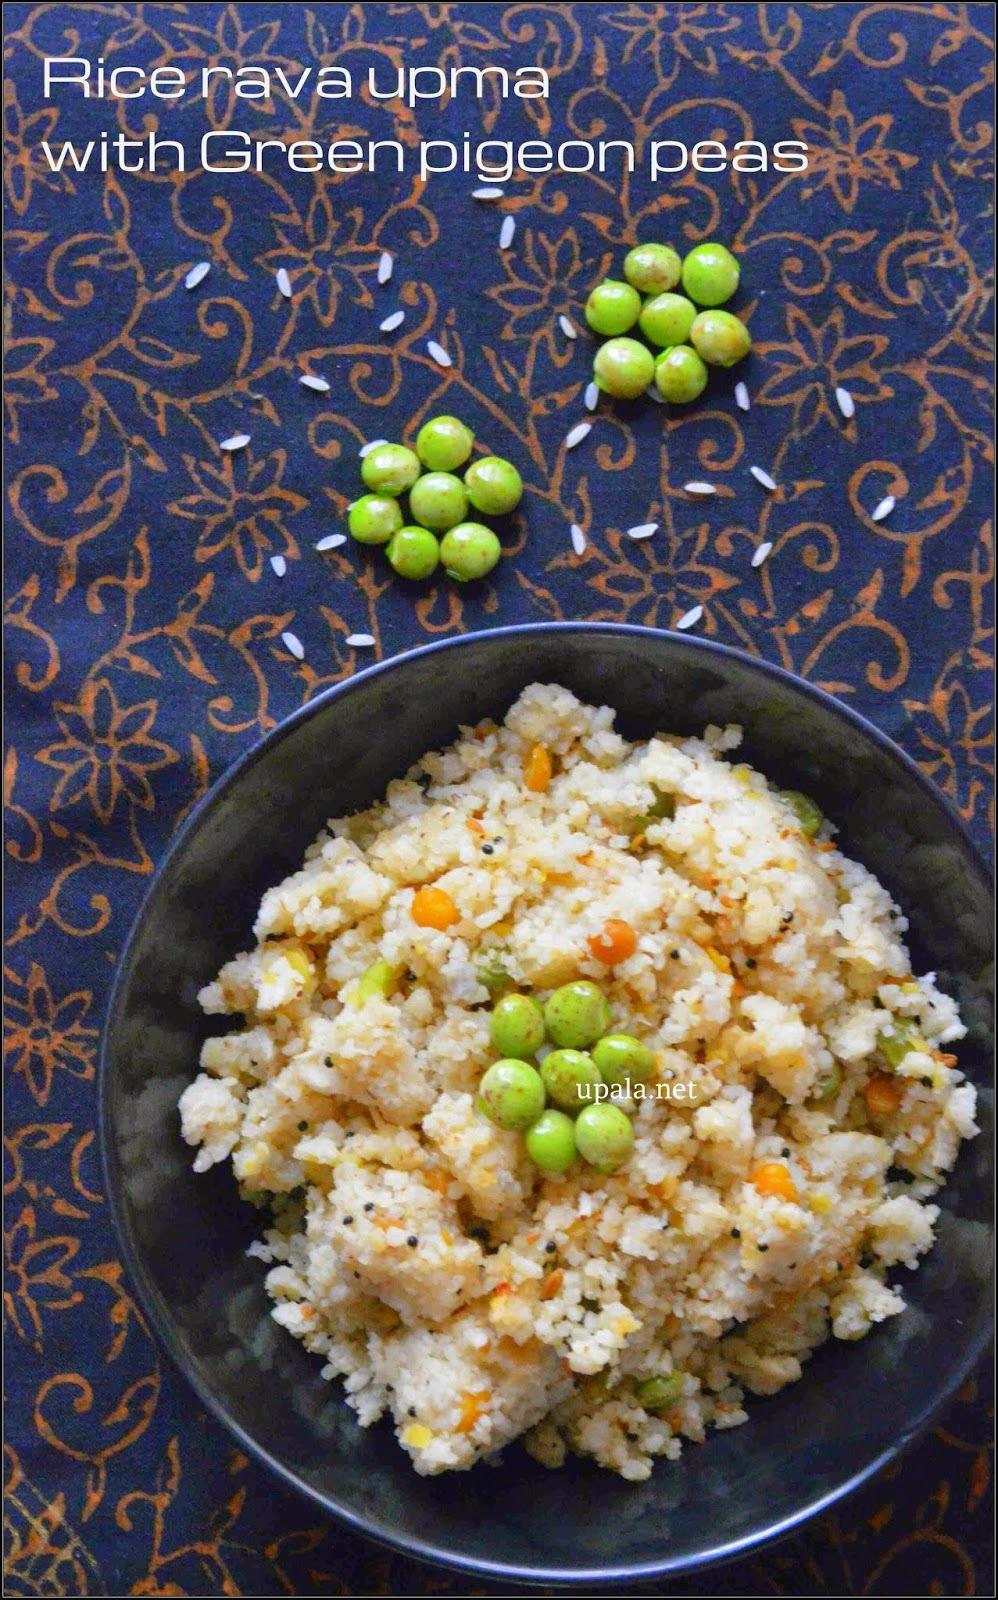 Rice rava upma with Green pigeon peas/Togarikalu akki tari uppittu/Arisi upma